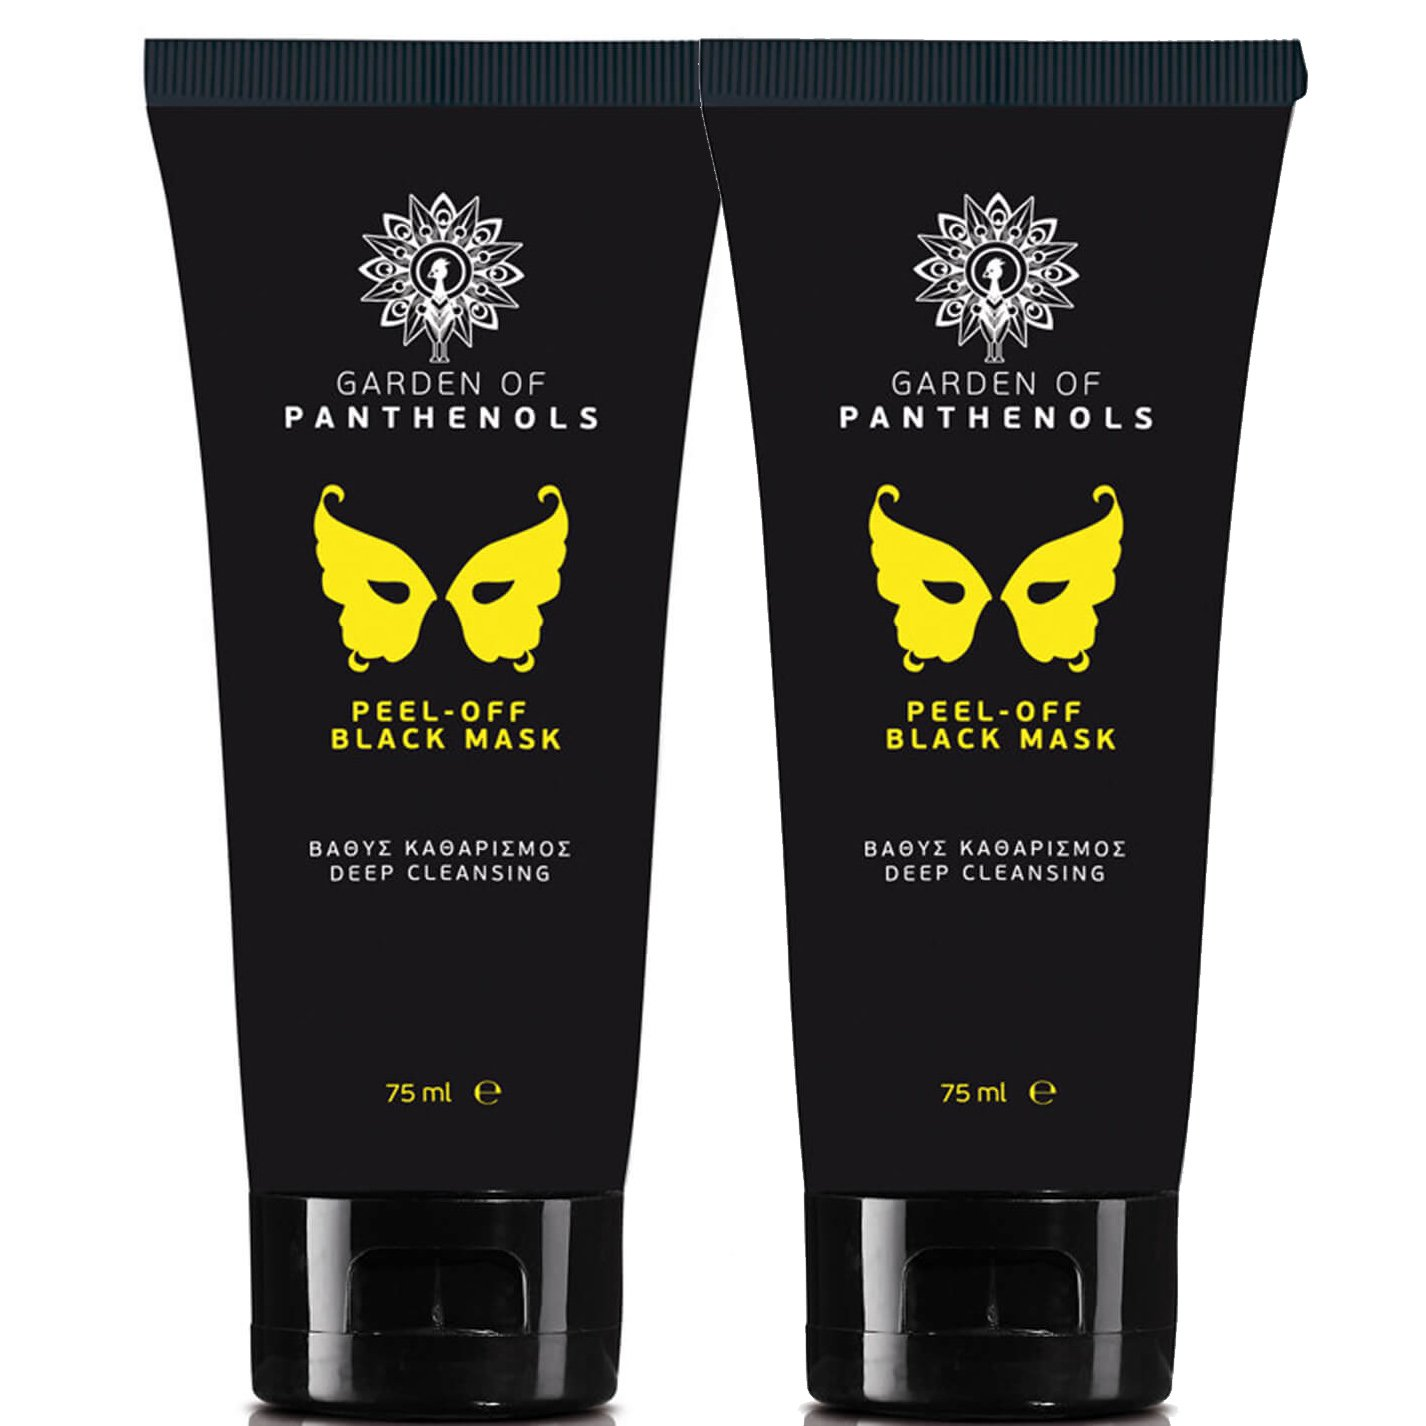 Garden of Panthenols Πακέτο Προσφοράς Peel-Off Black Mask Μάσκα για Βαθύ Καθαρισμό, Απολέπιση & Λάμψη 2x75ml 1+1 Δώρο